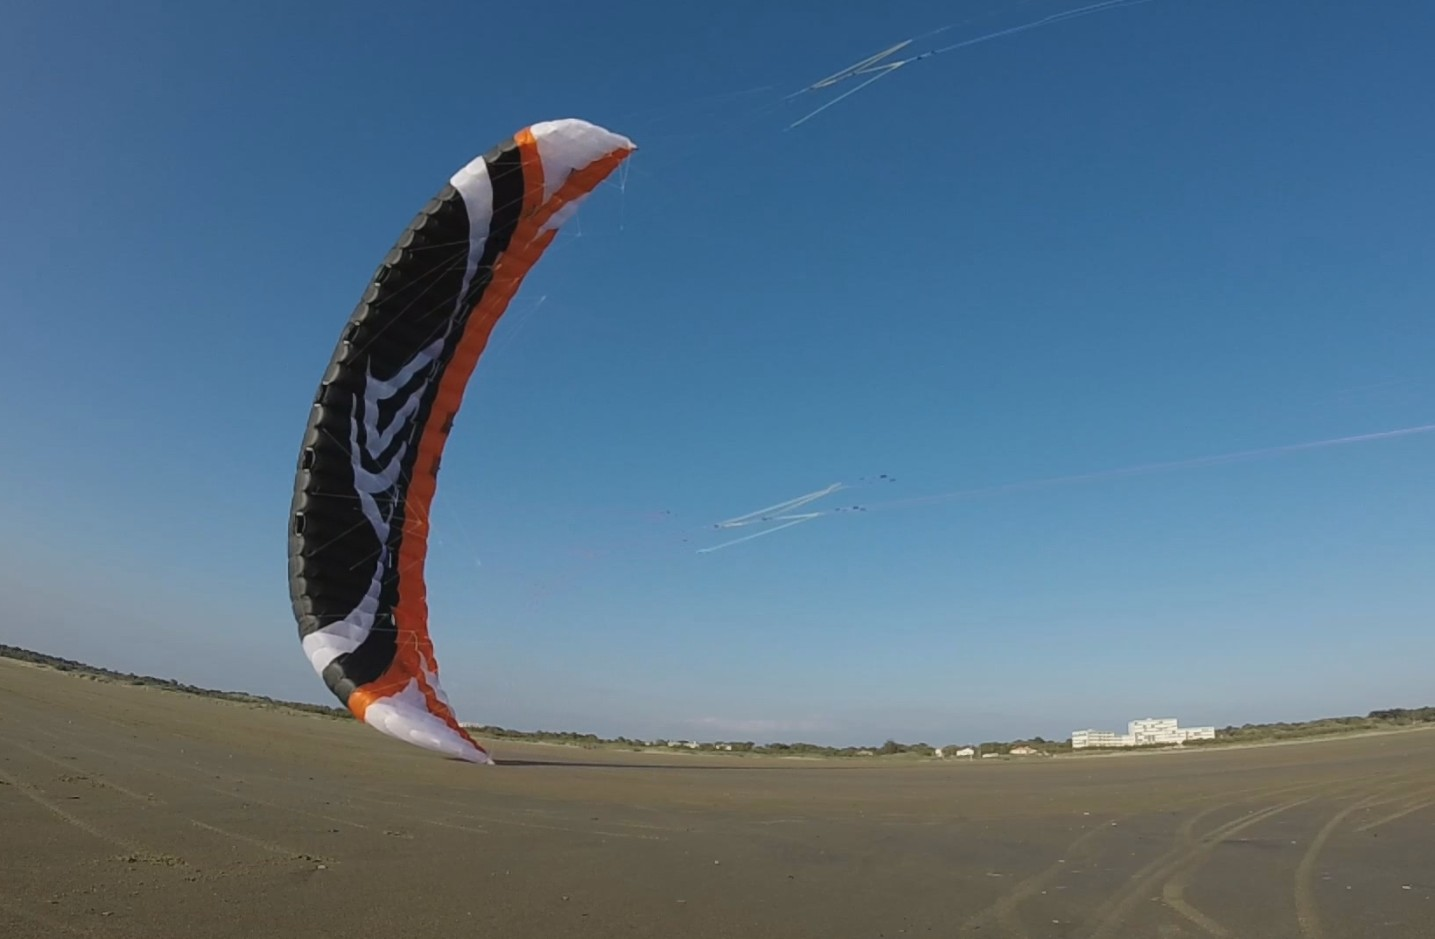 [VENDUE] Flysurfer speed4 lotus LIMITED EDITION 15m² - 1100e 475734ScreenHunter163Nov262001